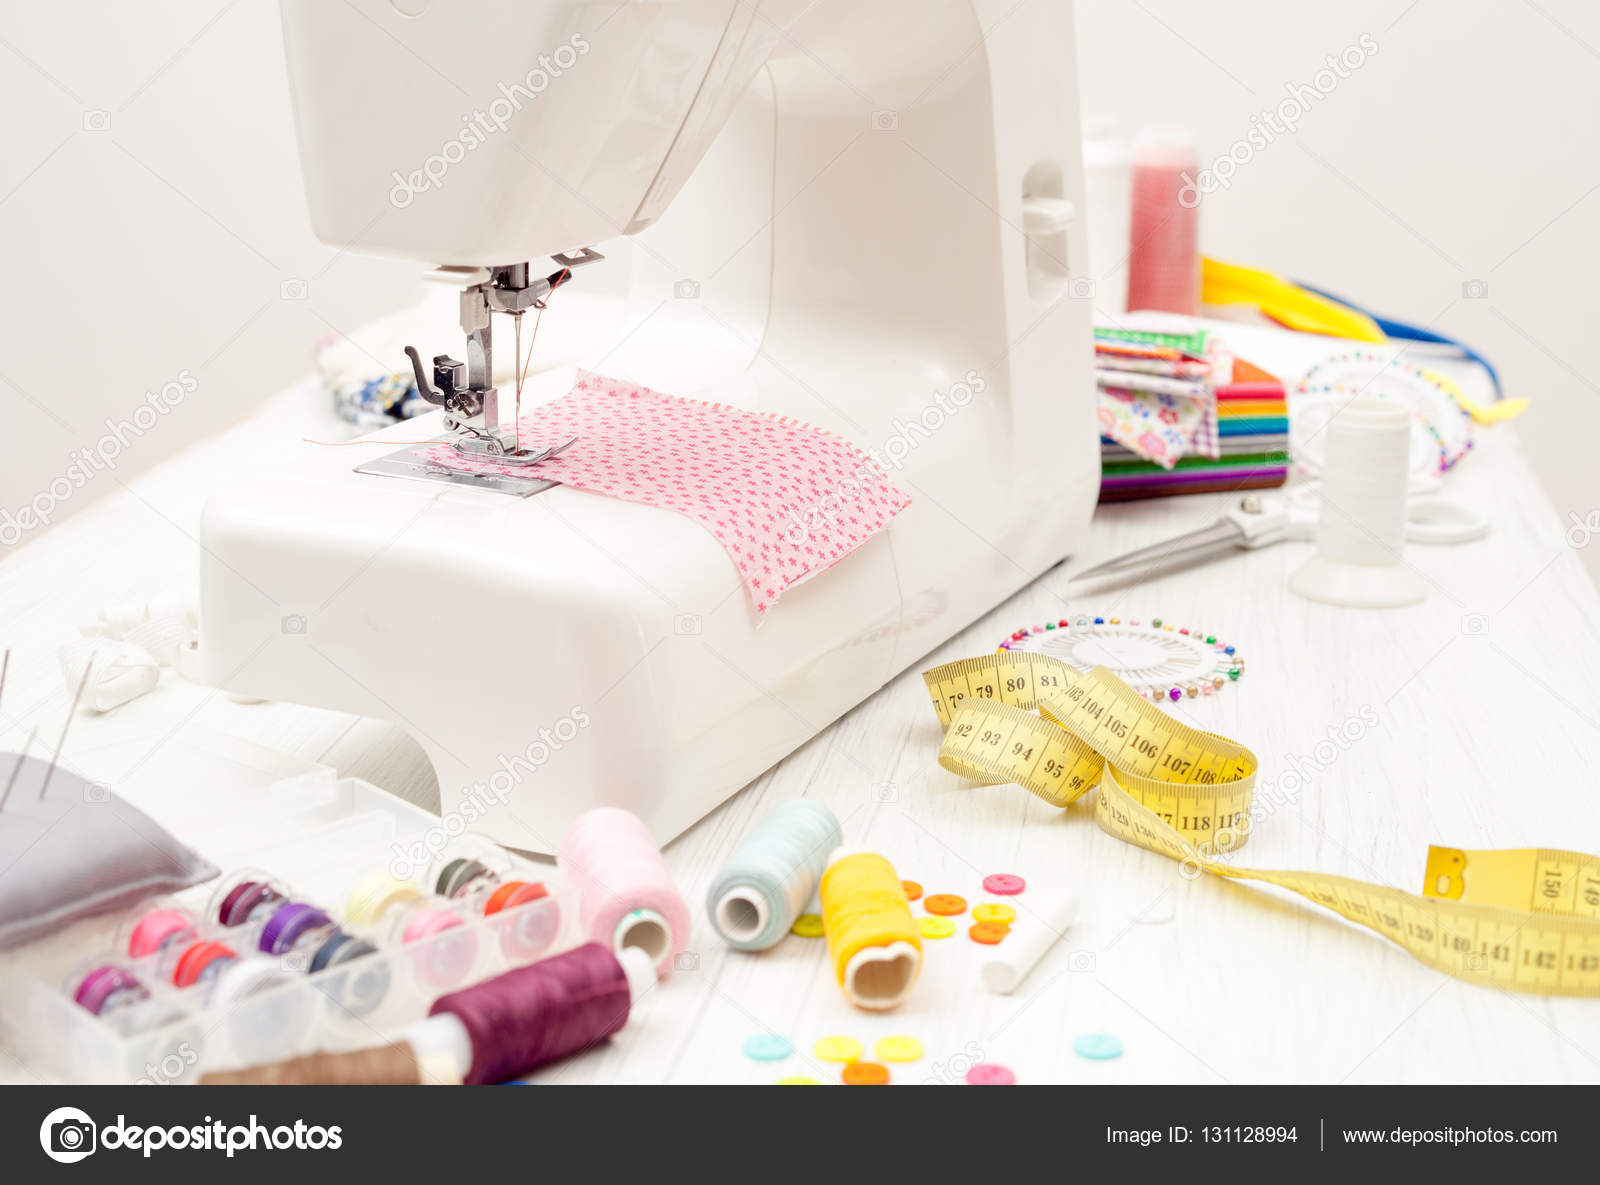 coser, coser en la máquina de coser, suministros de costura, color s ...